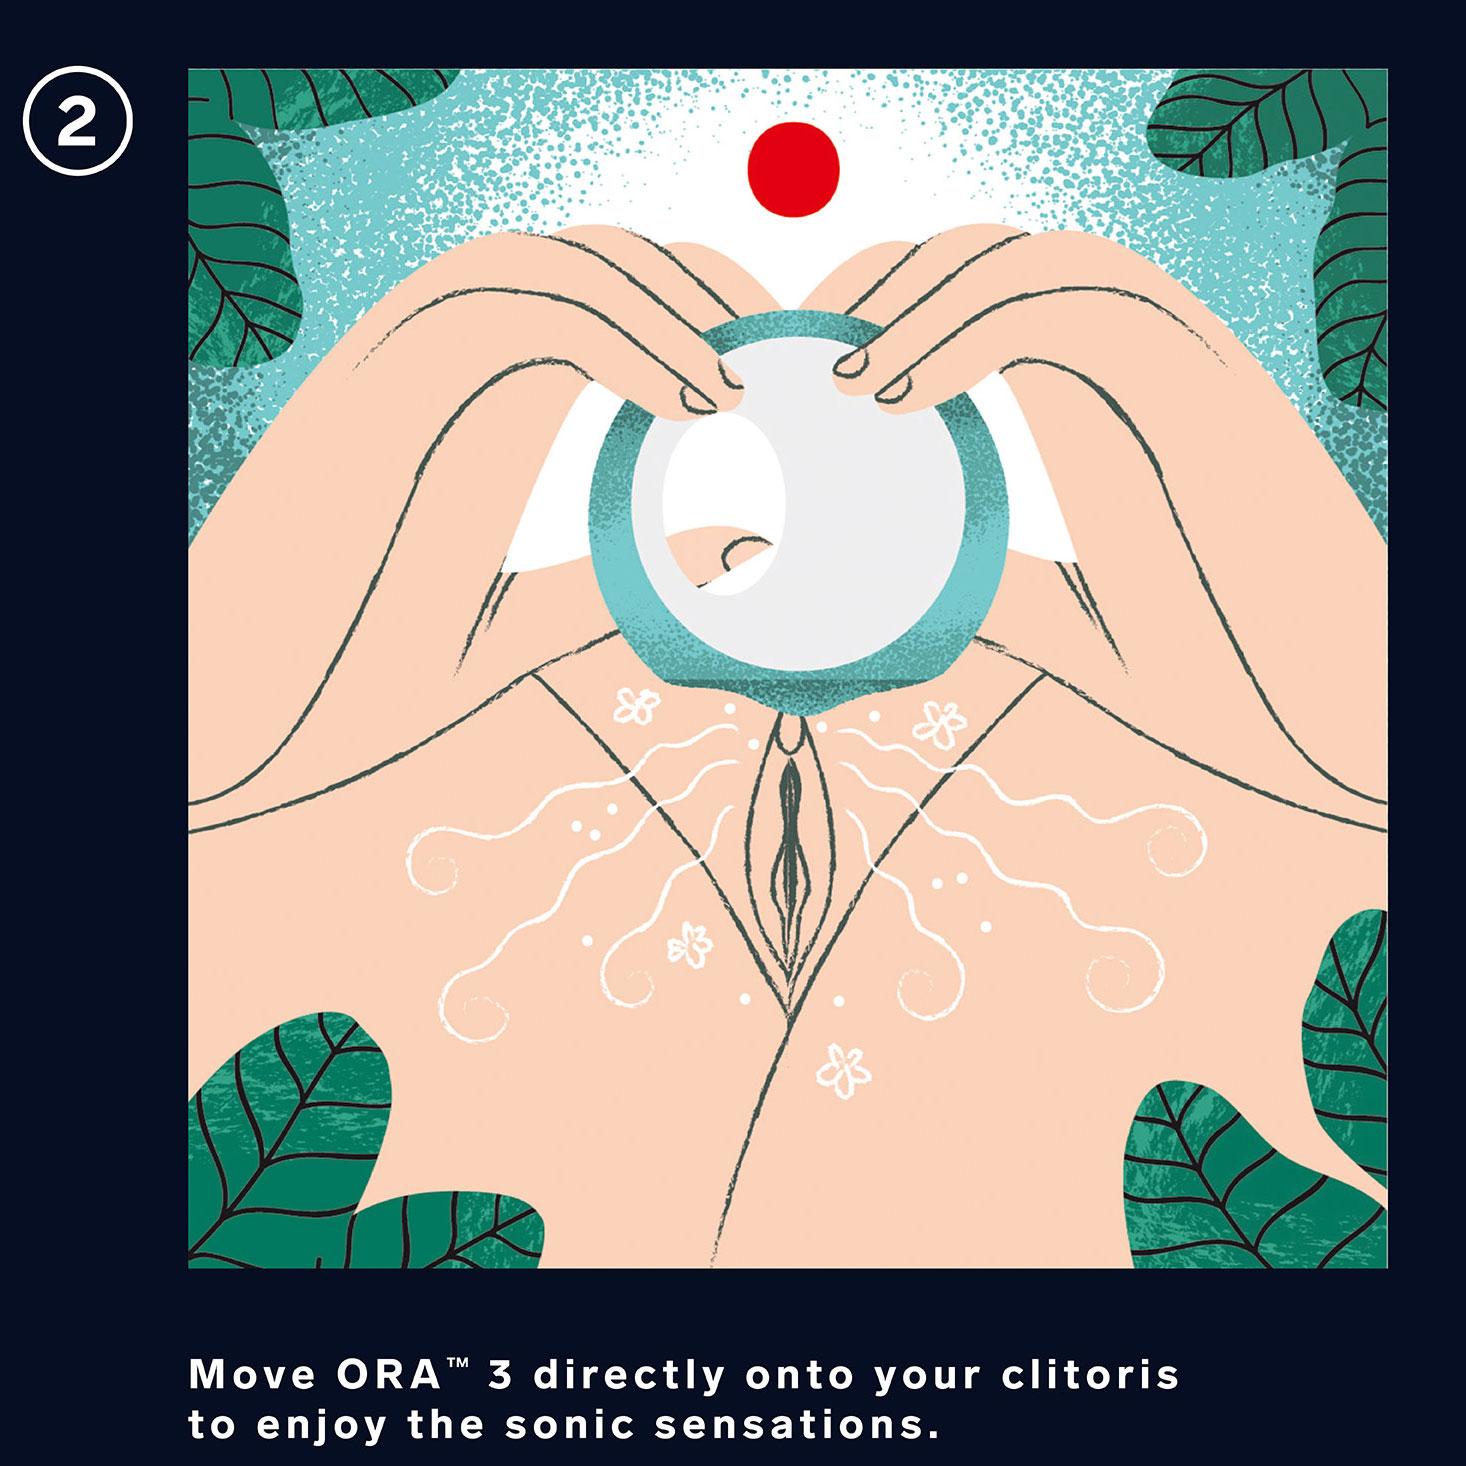 LELO ORA 3 Vibrating Rotating Oral Sex Stimulator - How To 2